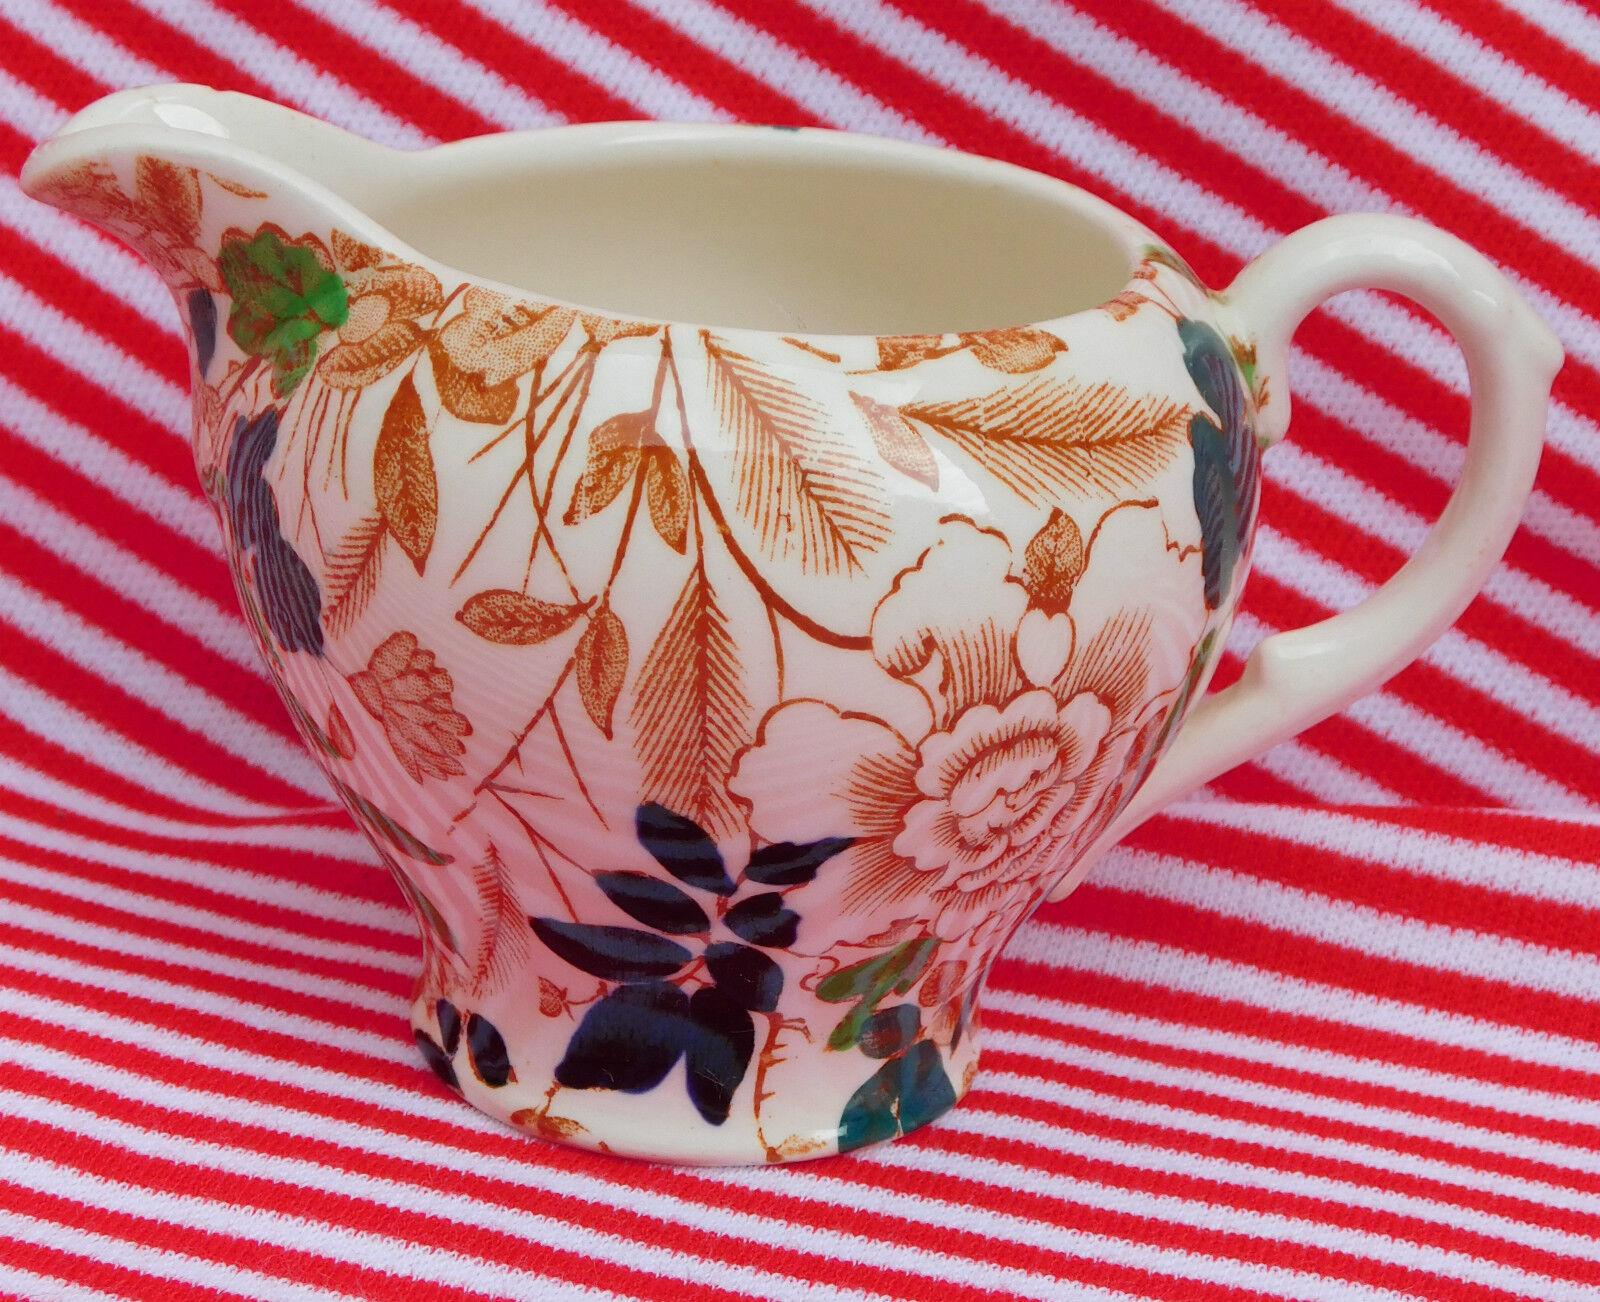 Royal Cauldon small milk jug Creamer Bittersweet Vintage Staffordshire pottery